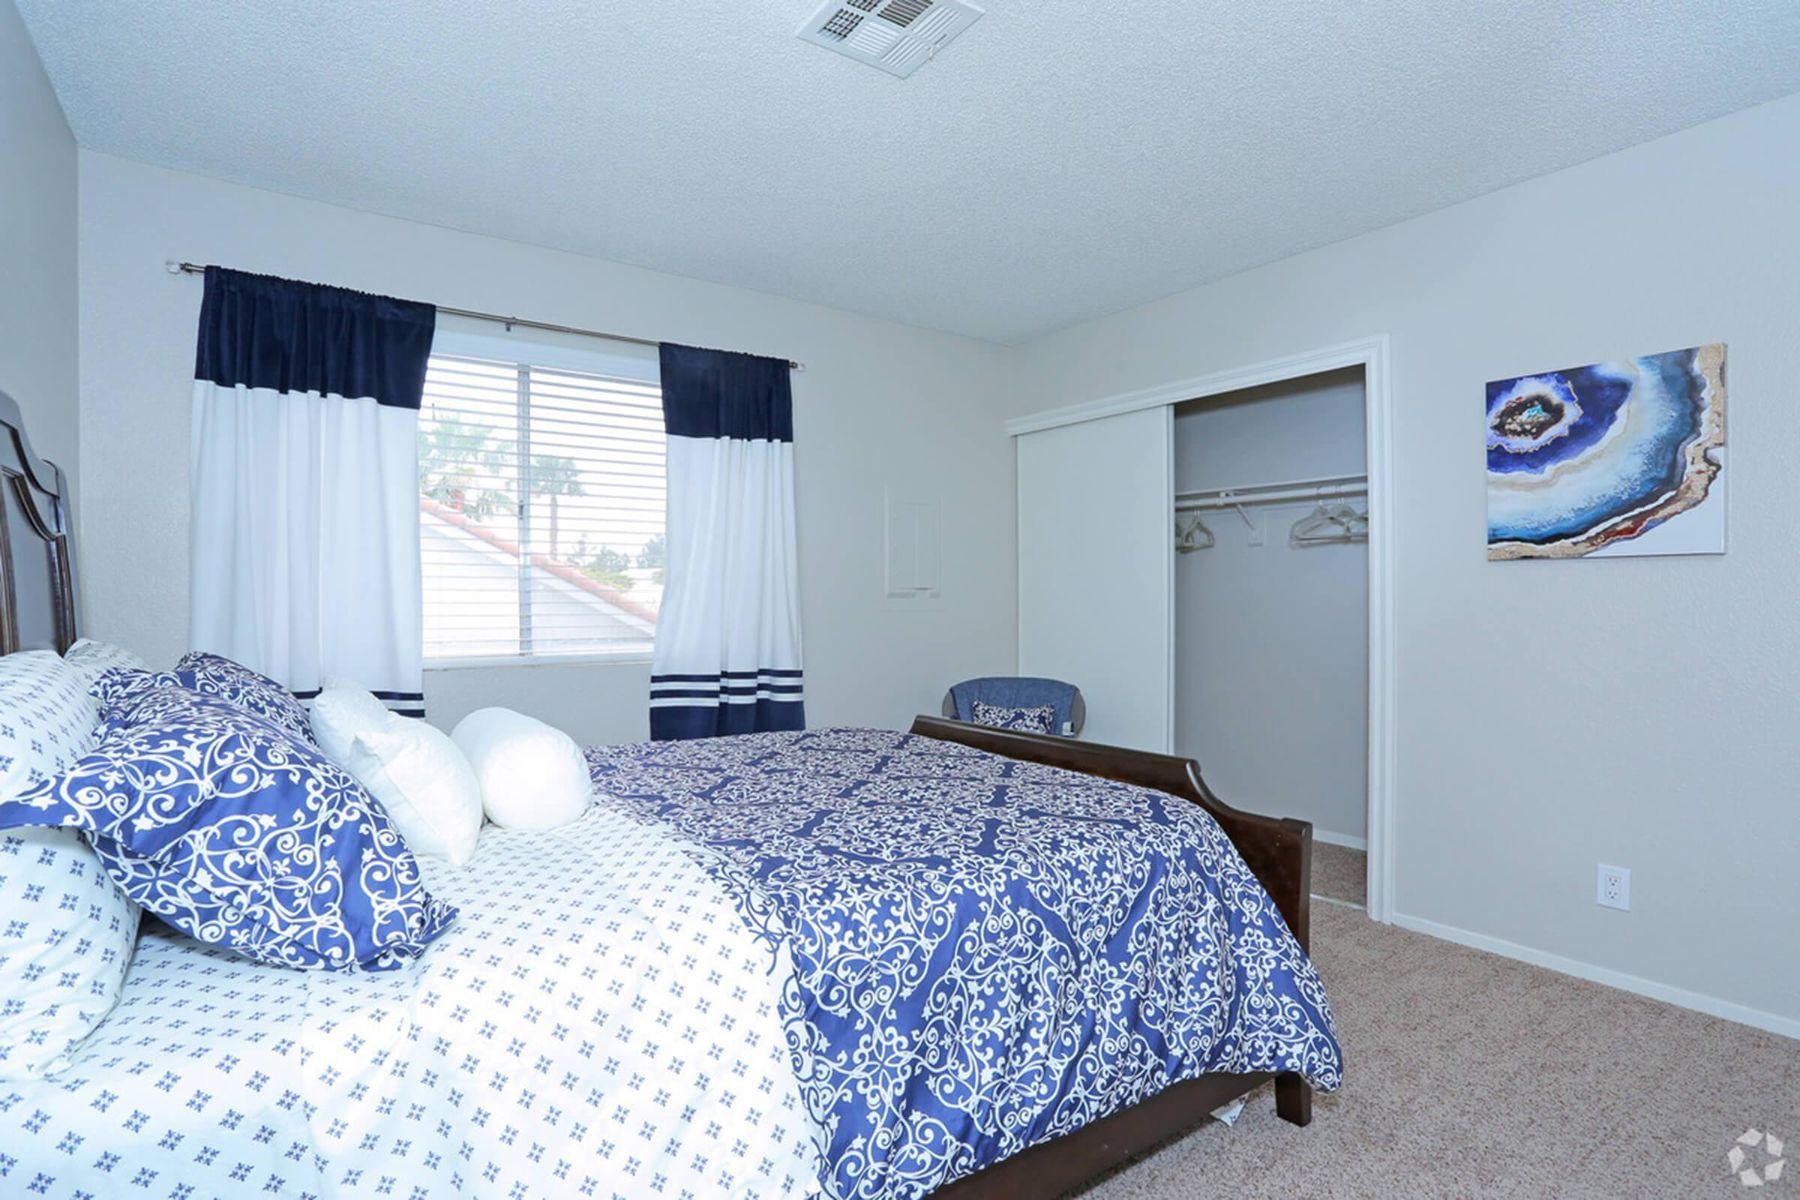 sunset-hills-apartments-henderson-nv-2br-2ba---960-sf-bedroom (2).jpg